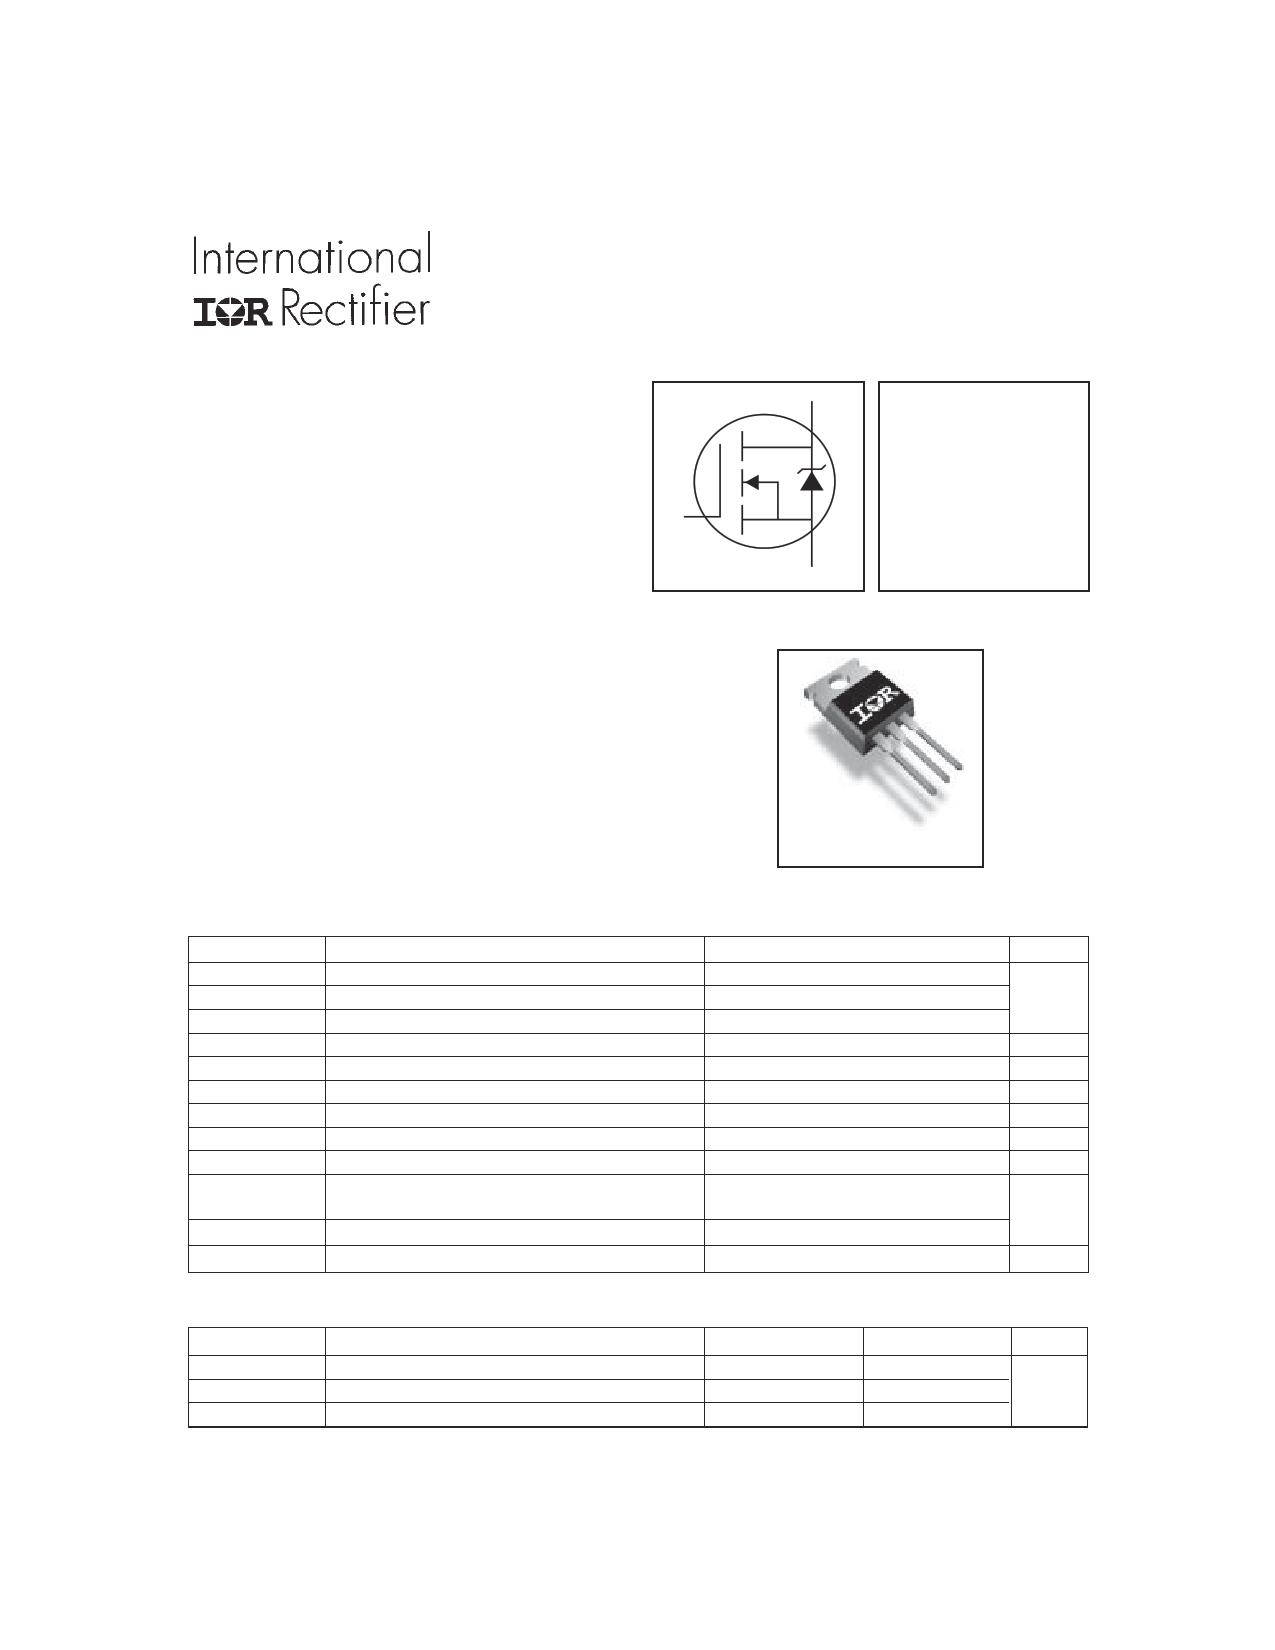 IRFZ46N Datasheet, IRFZ46N PDF,ピン配置, 機能